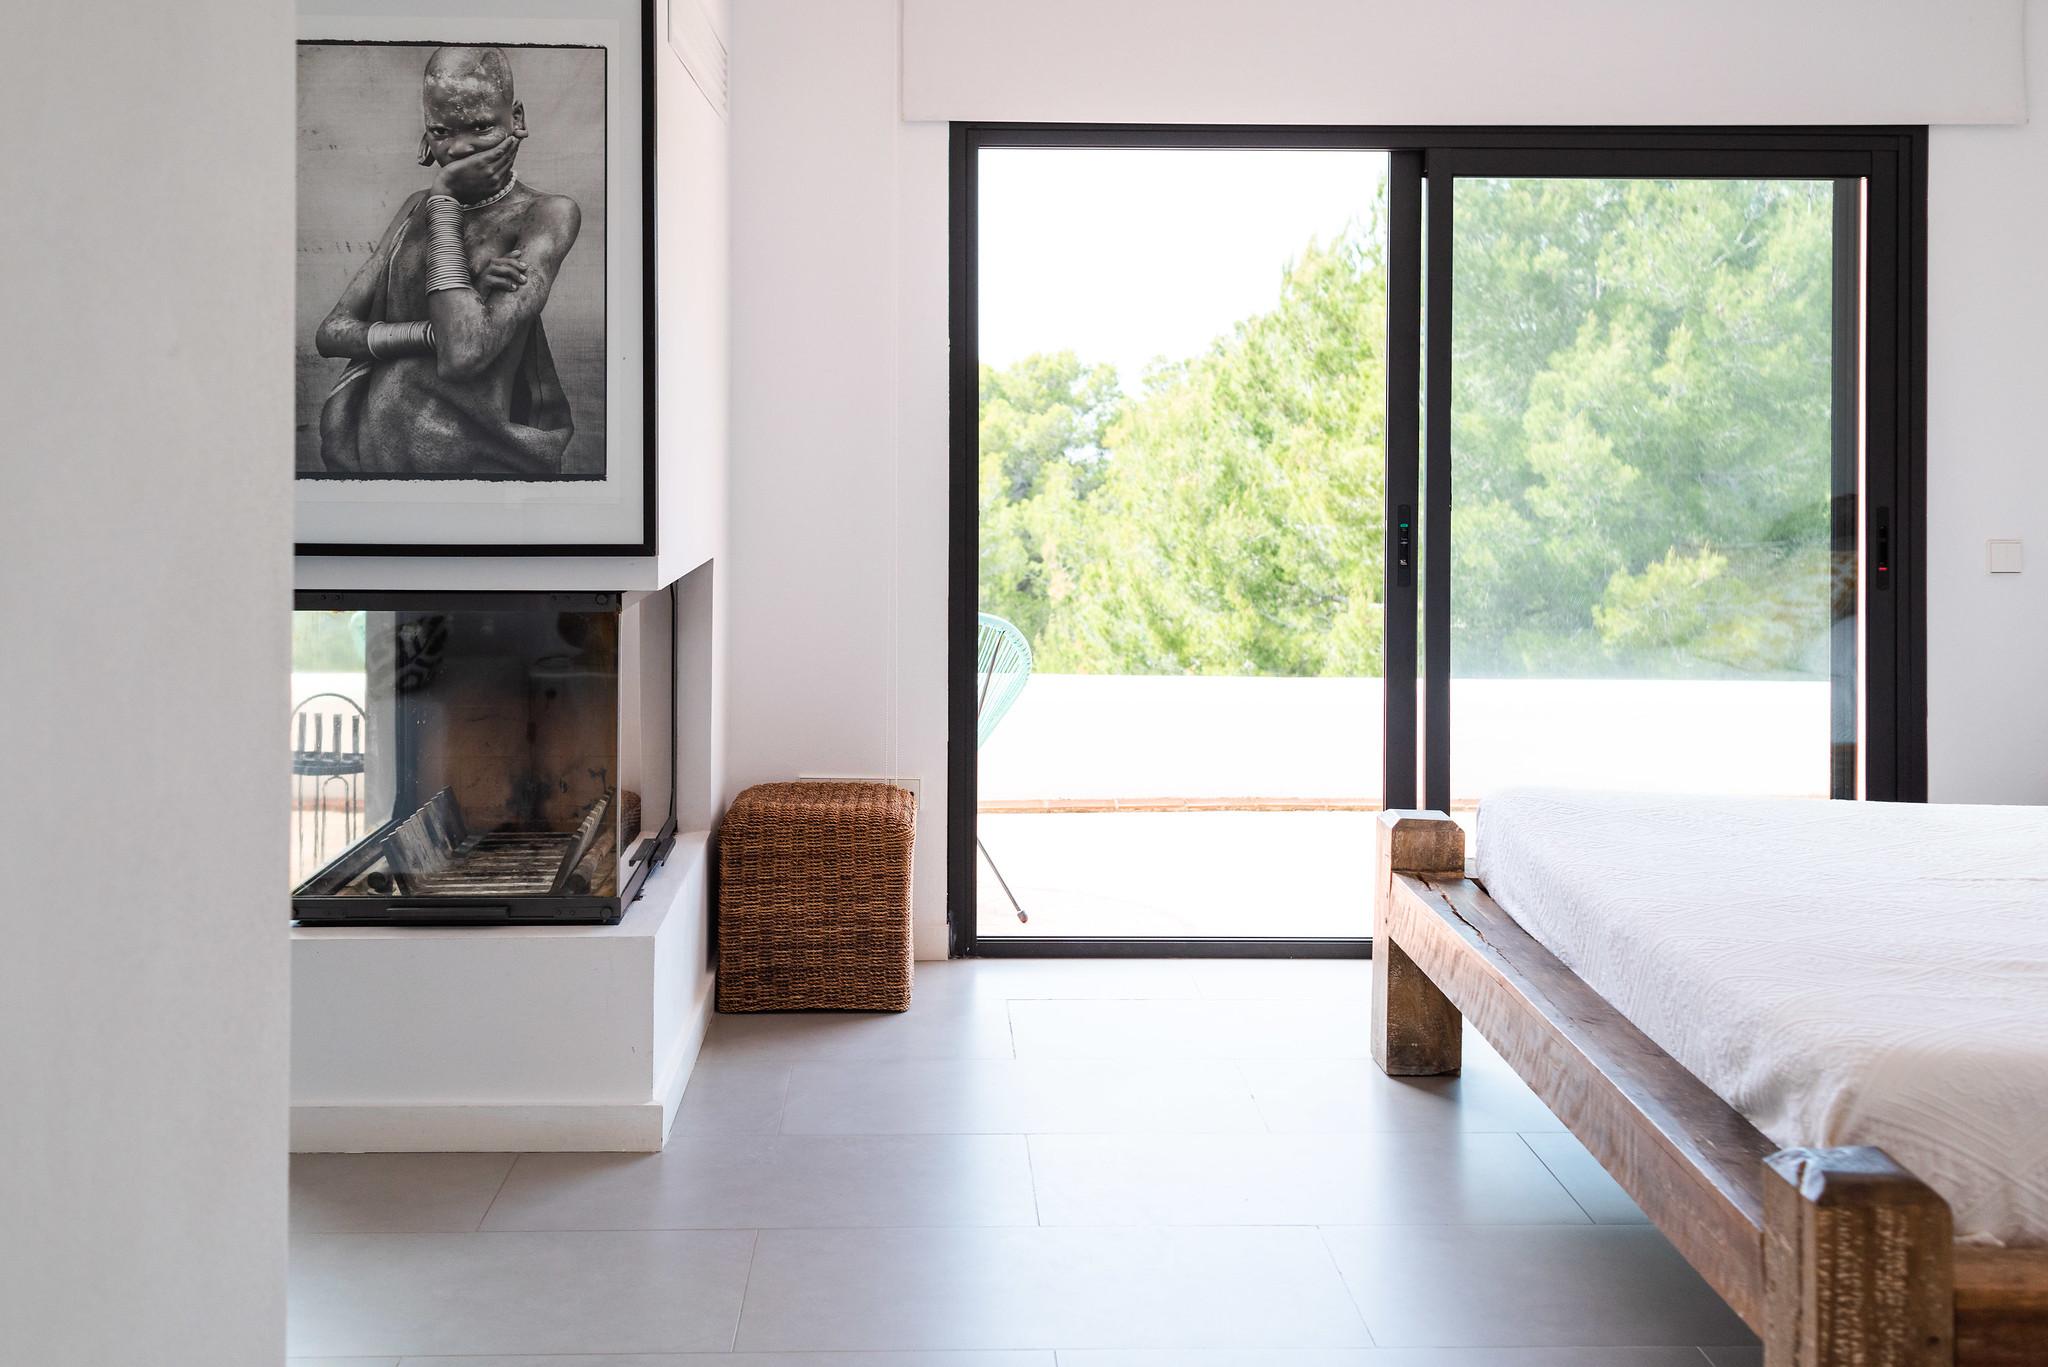 https://www.white-ibiza.com/wp-content/uploads/2020/06/white-ibiza-villas-villa-azul-interior-fireplace.jpg